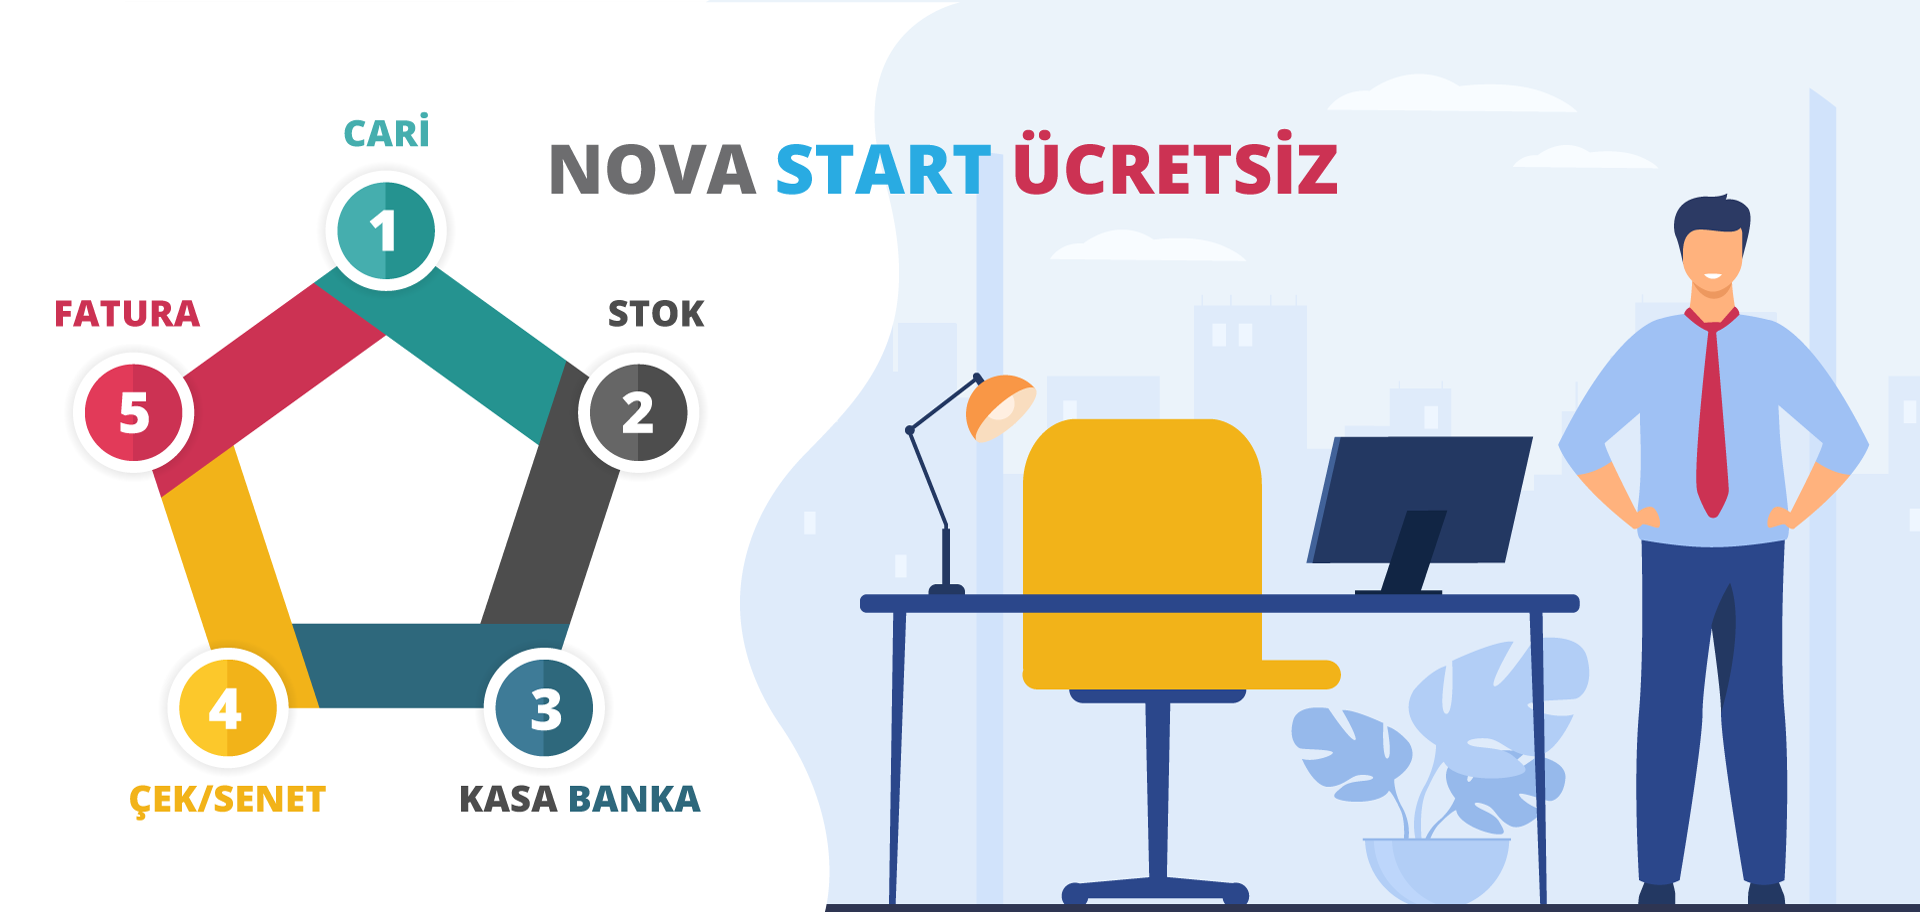 Nova Start Ücretsiz